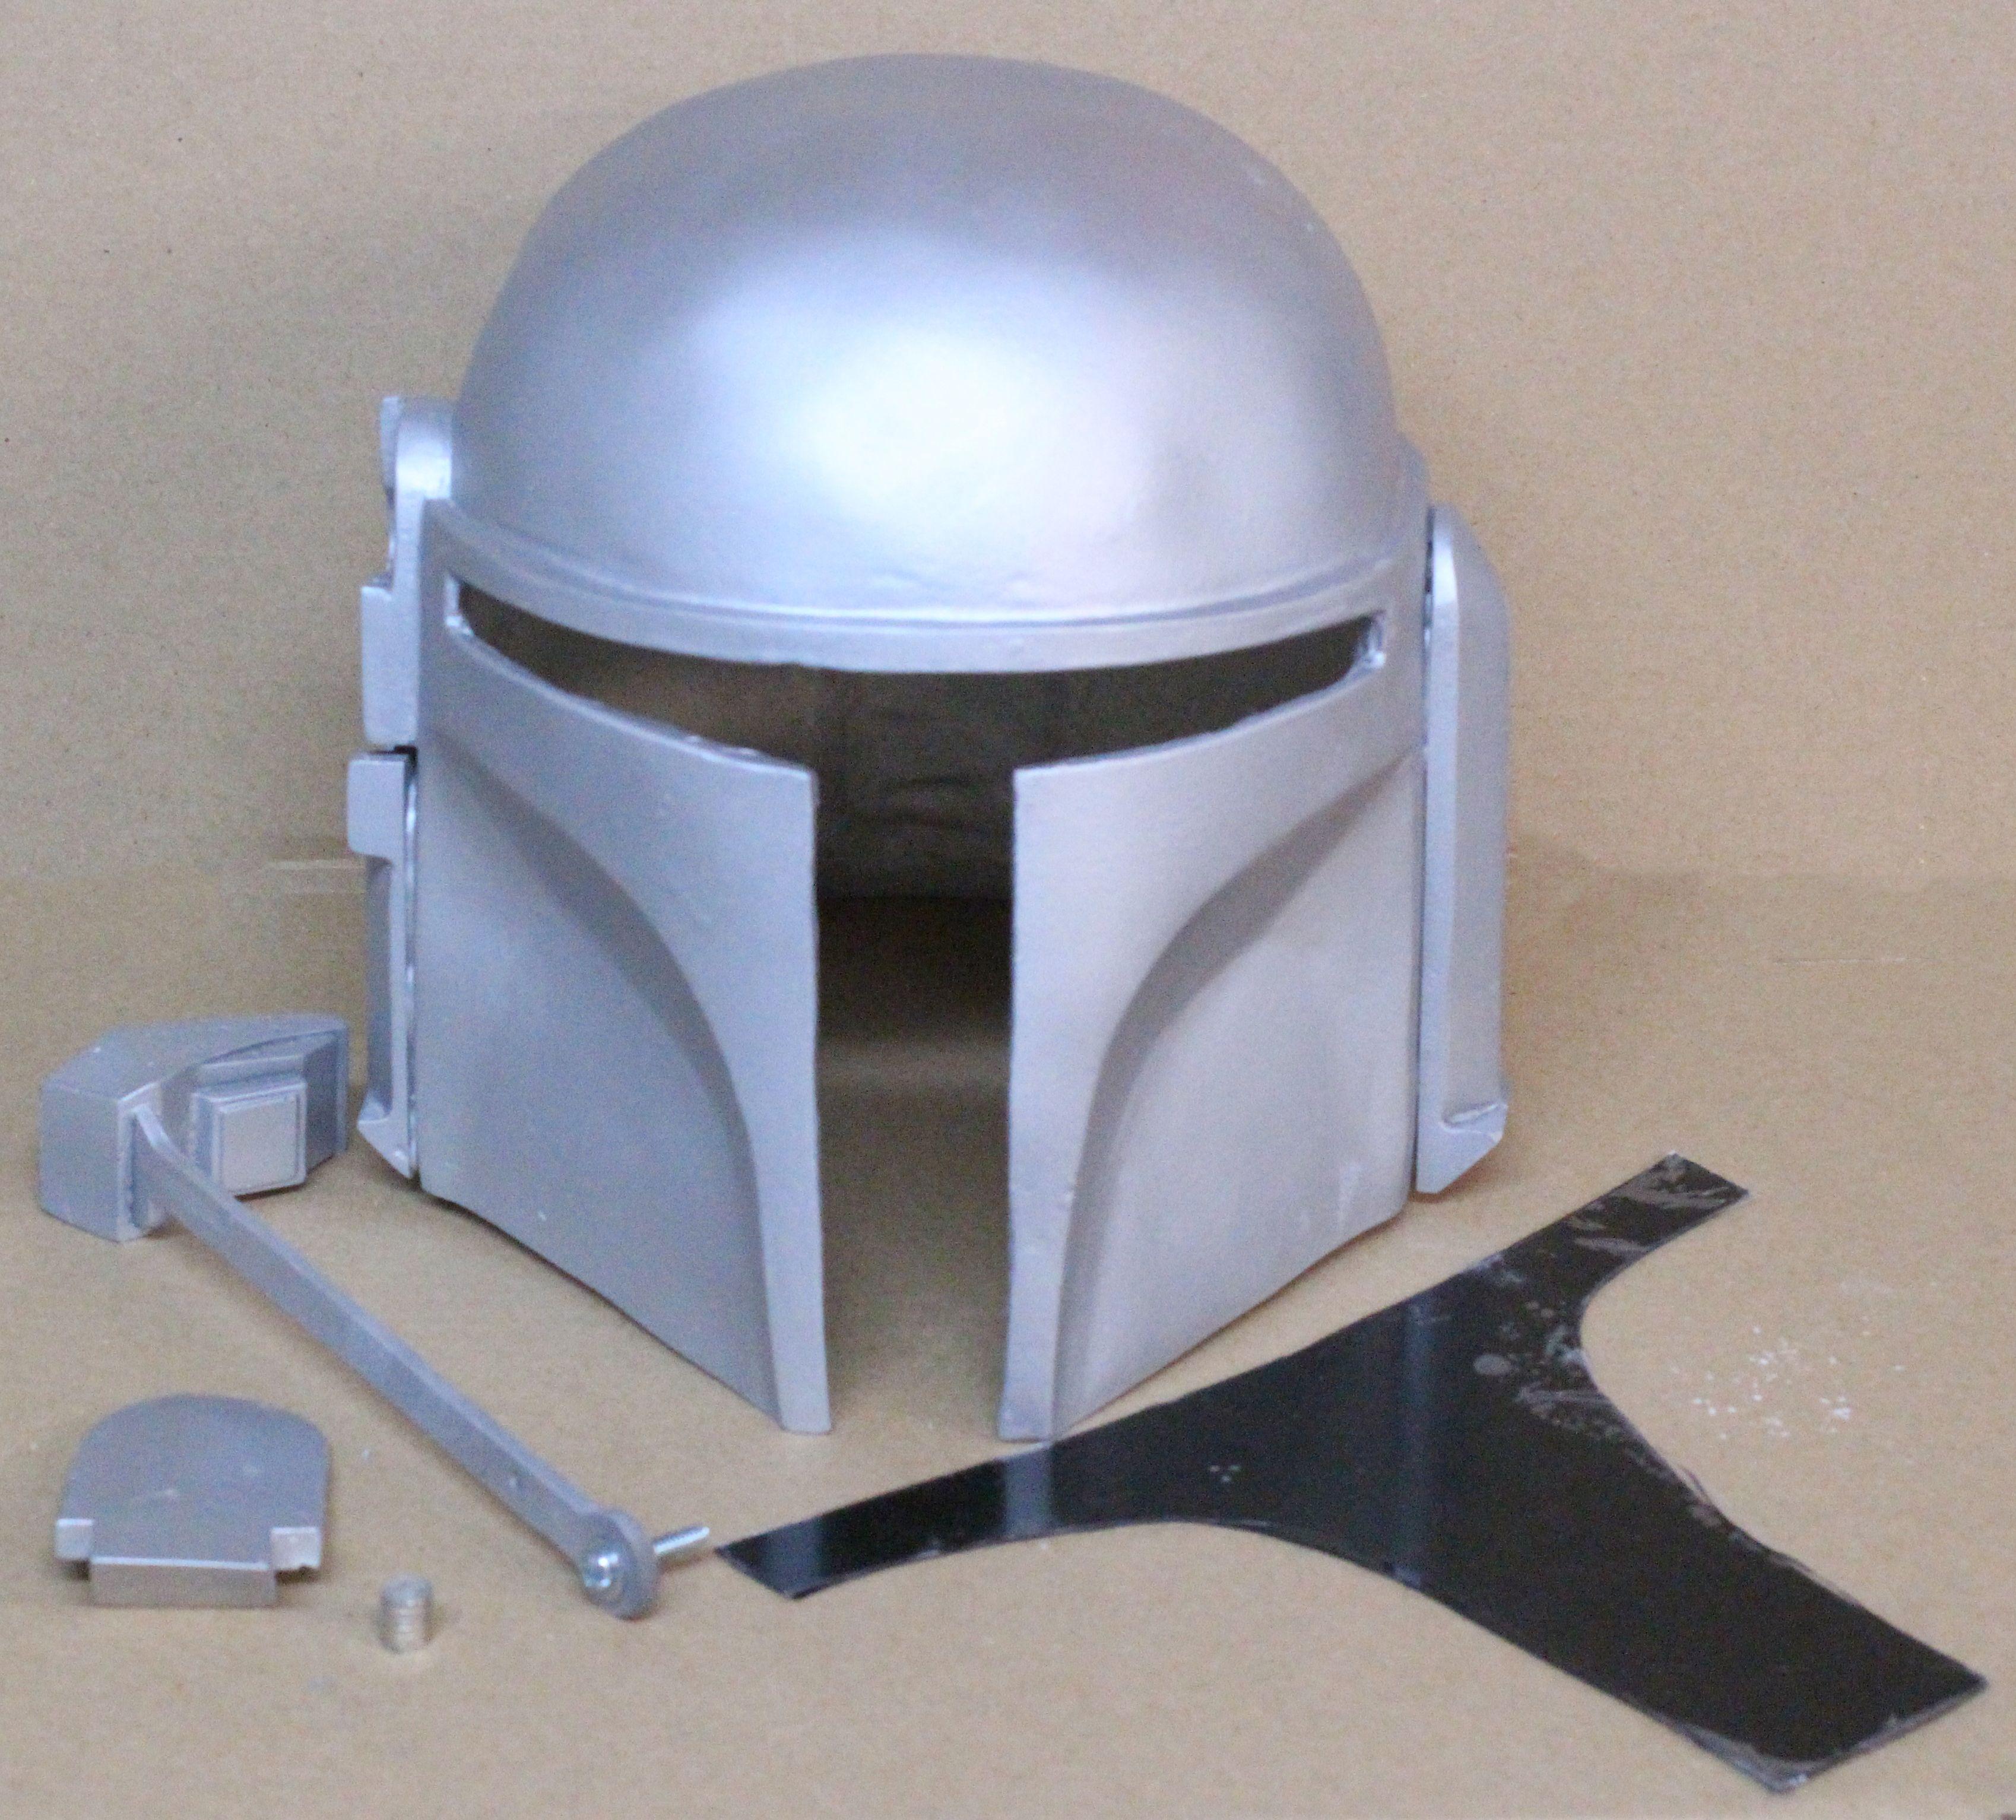 The Mandalorian Arsenal/Classic Mandalorian Helmet   Wishlist ...